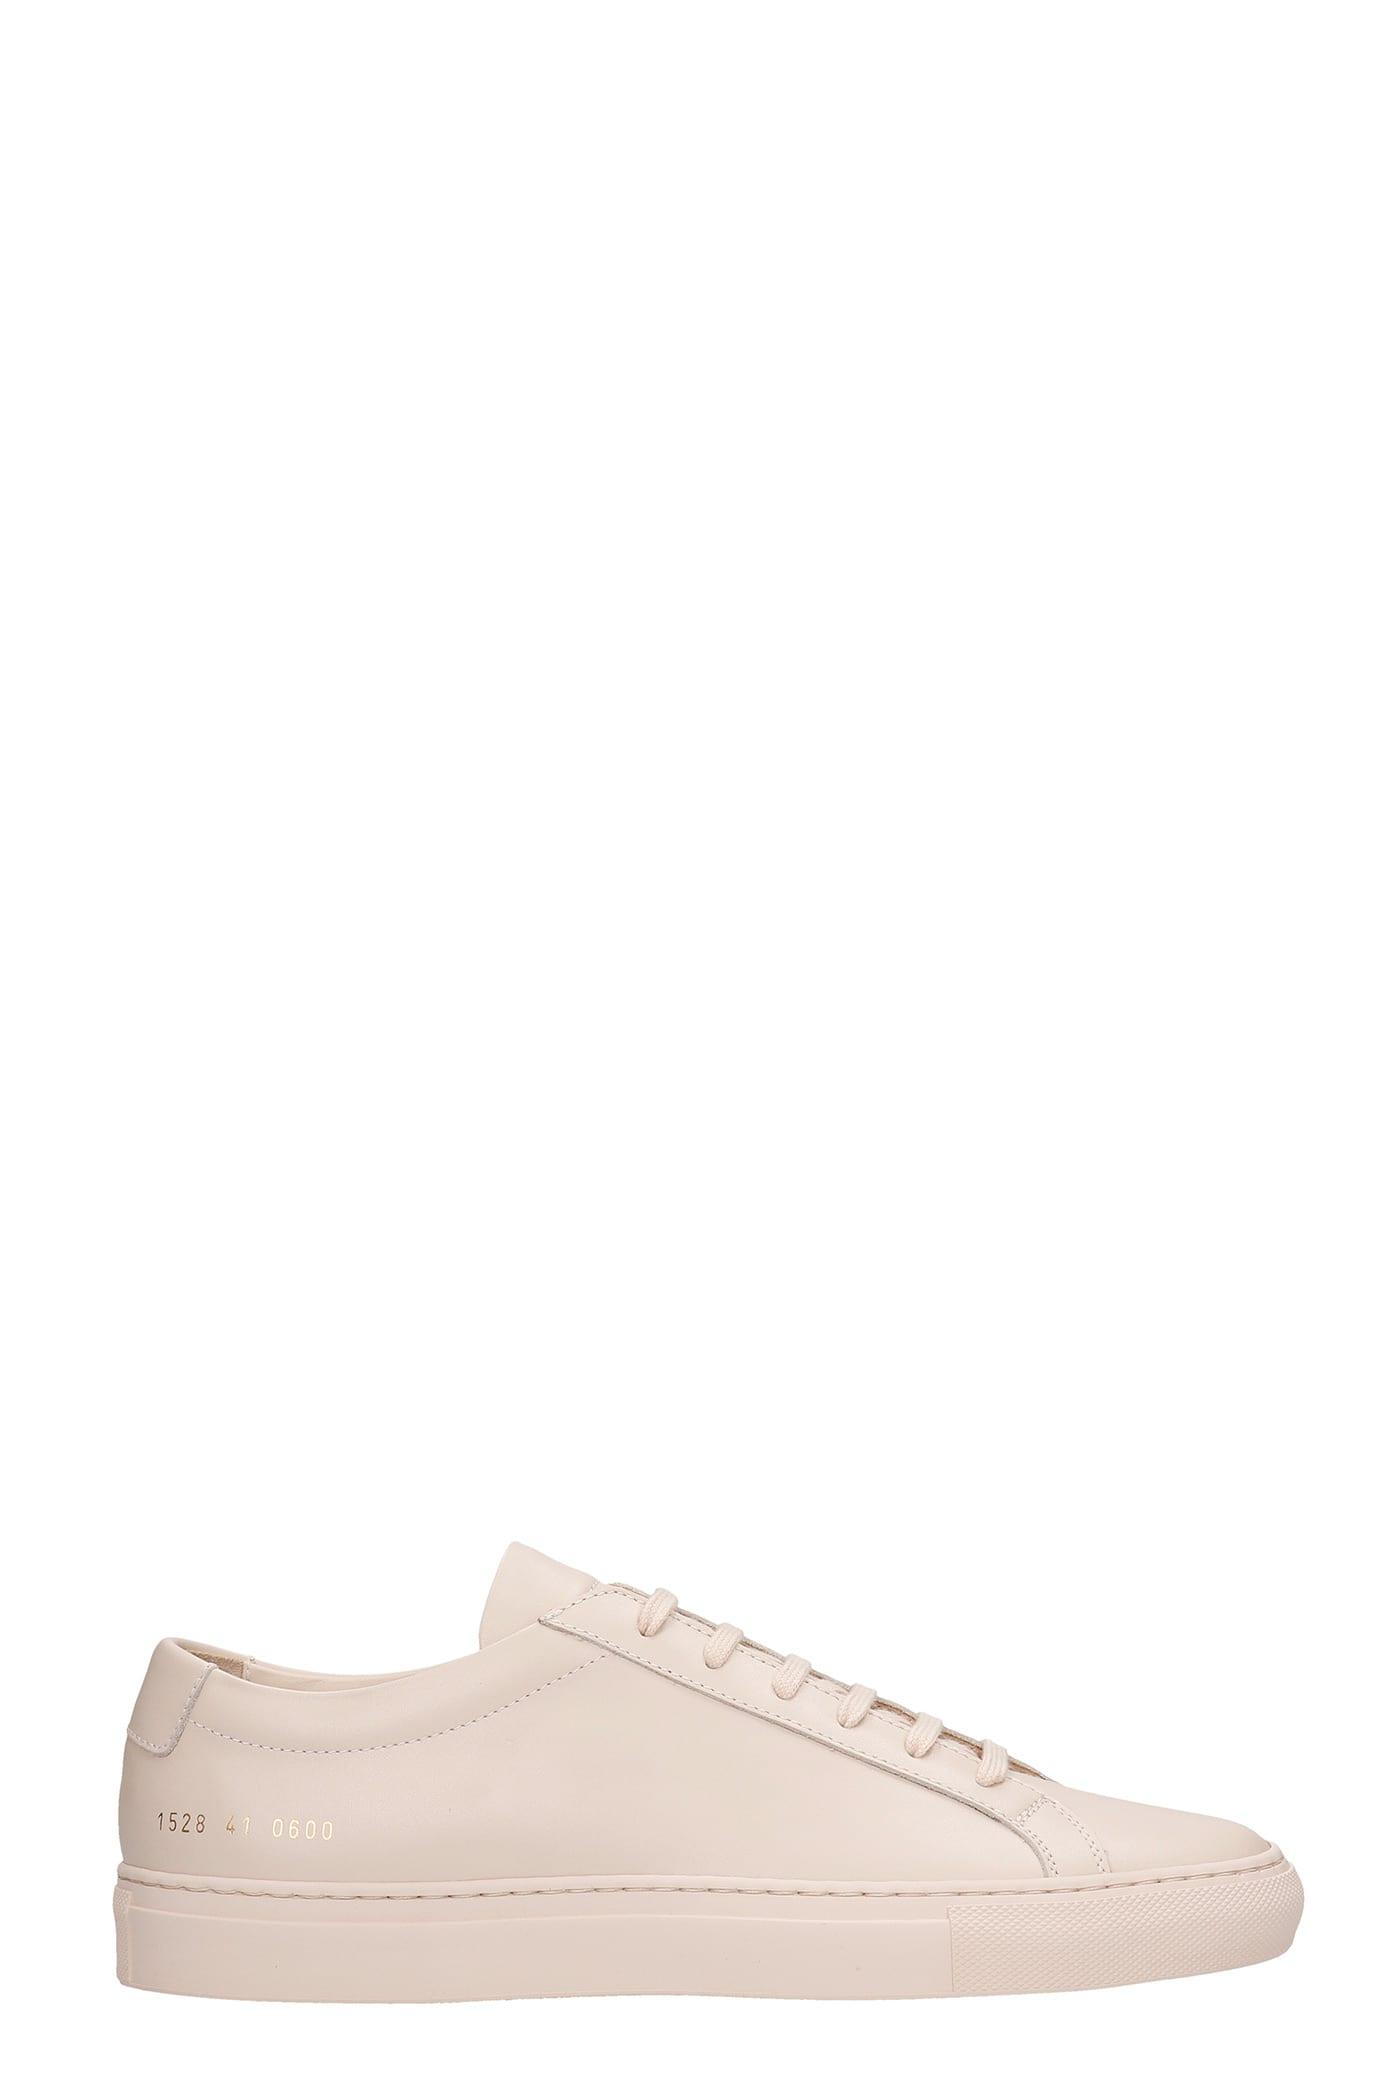 Original Achill Sneakers In Powder Leather